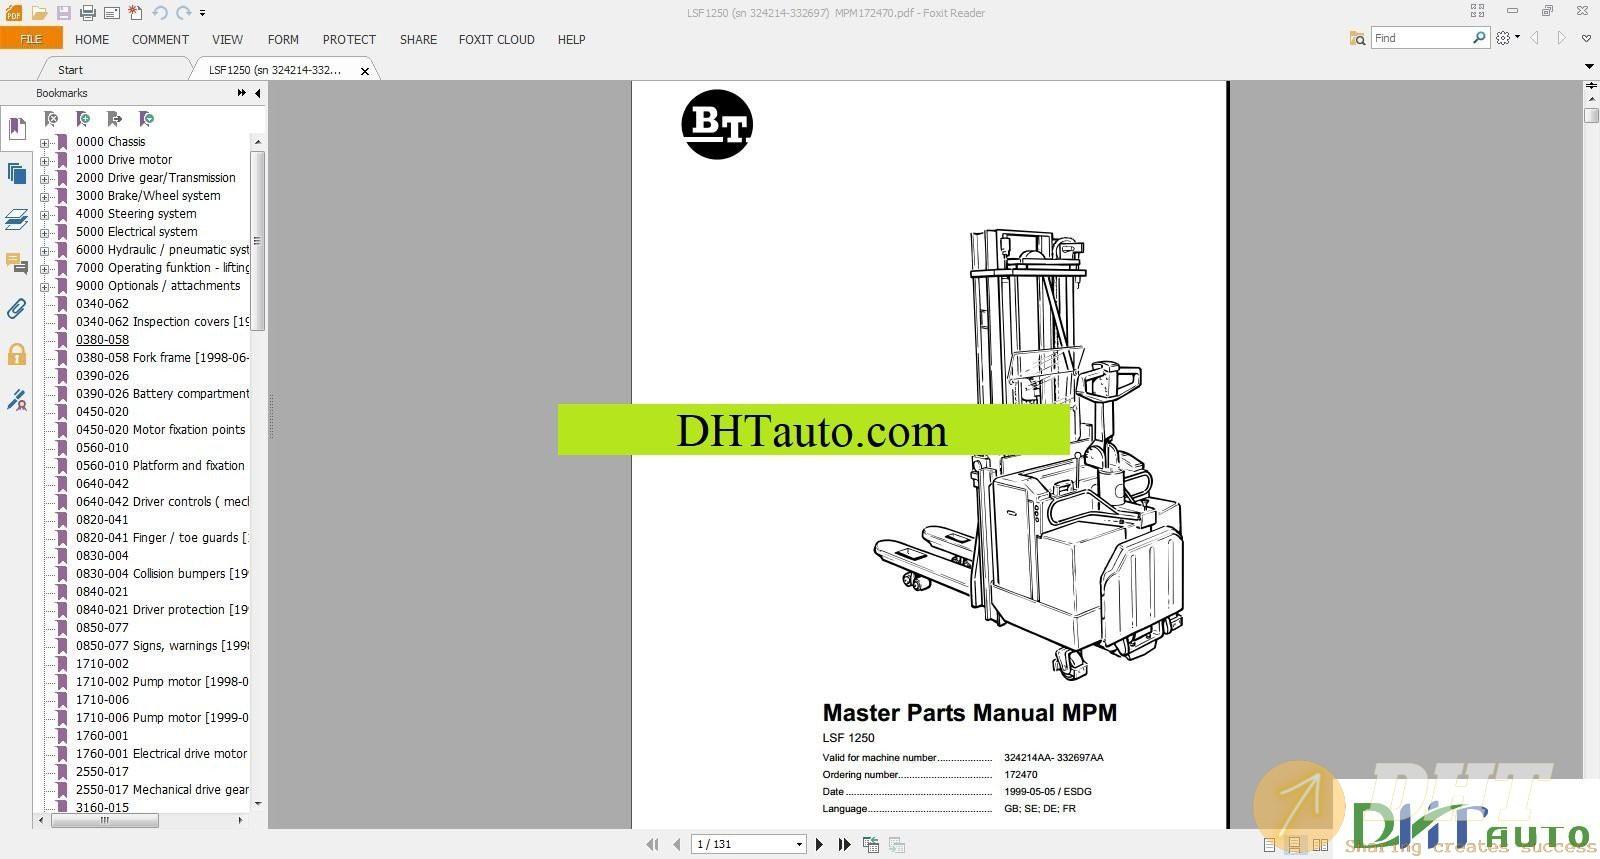 BT-Walkie-Forklift-Parts-Catalog-4.jpg